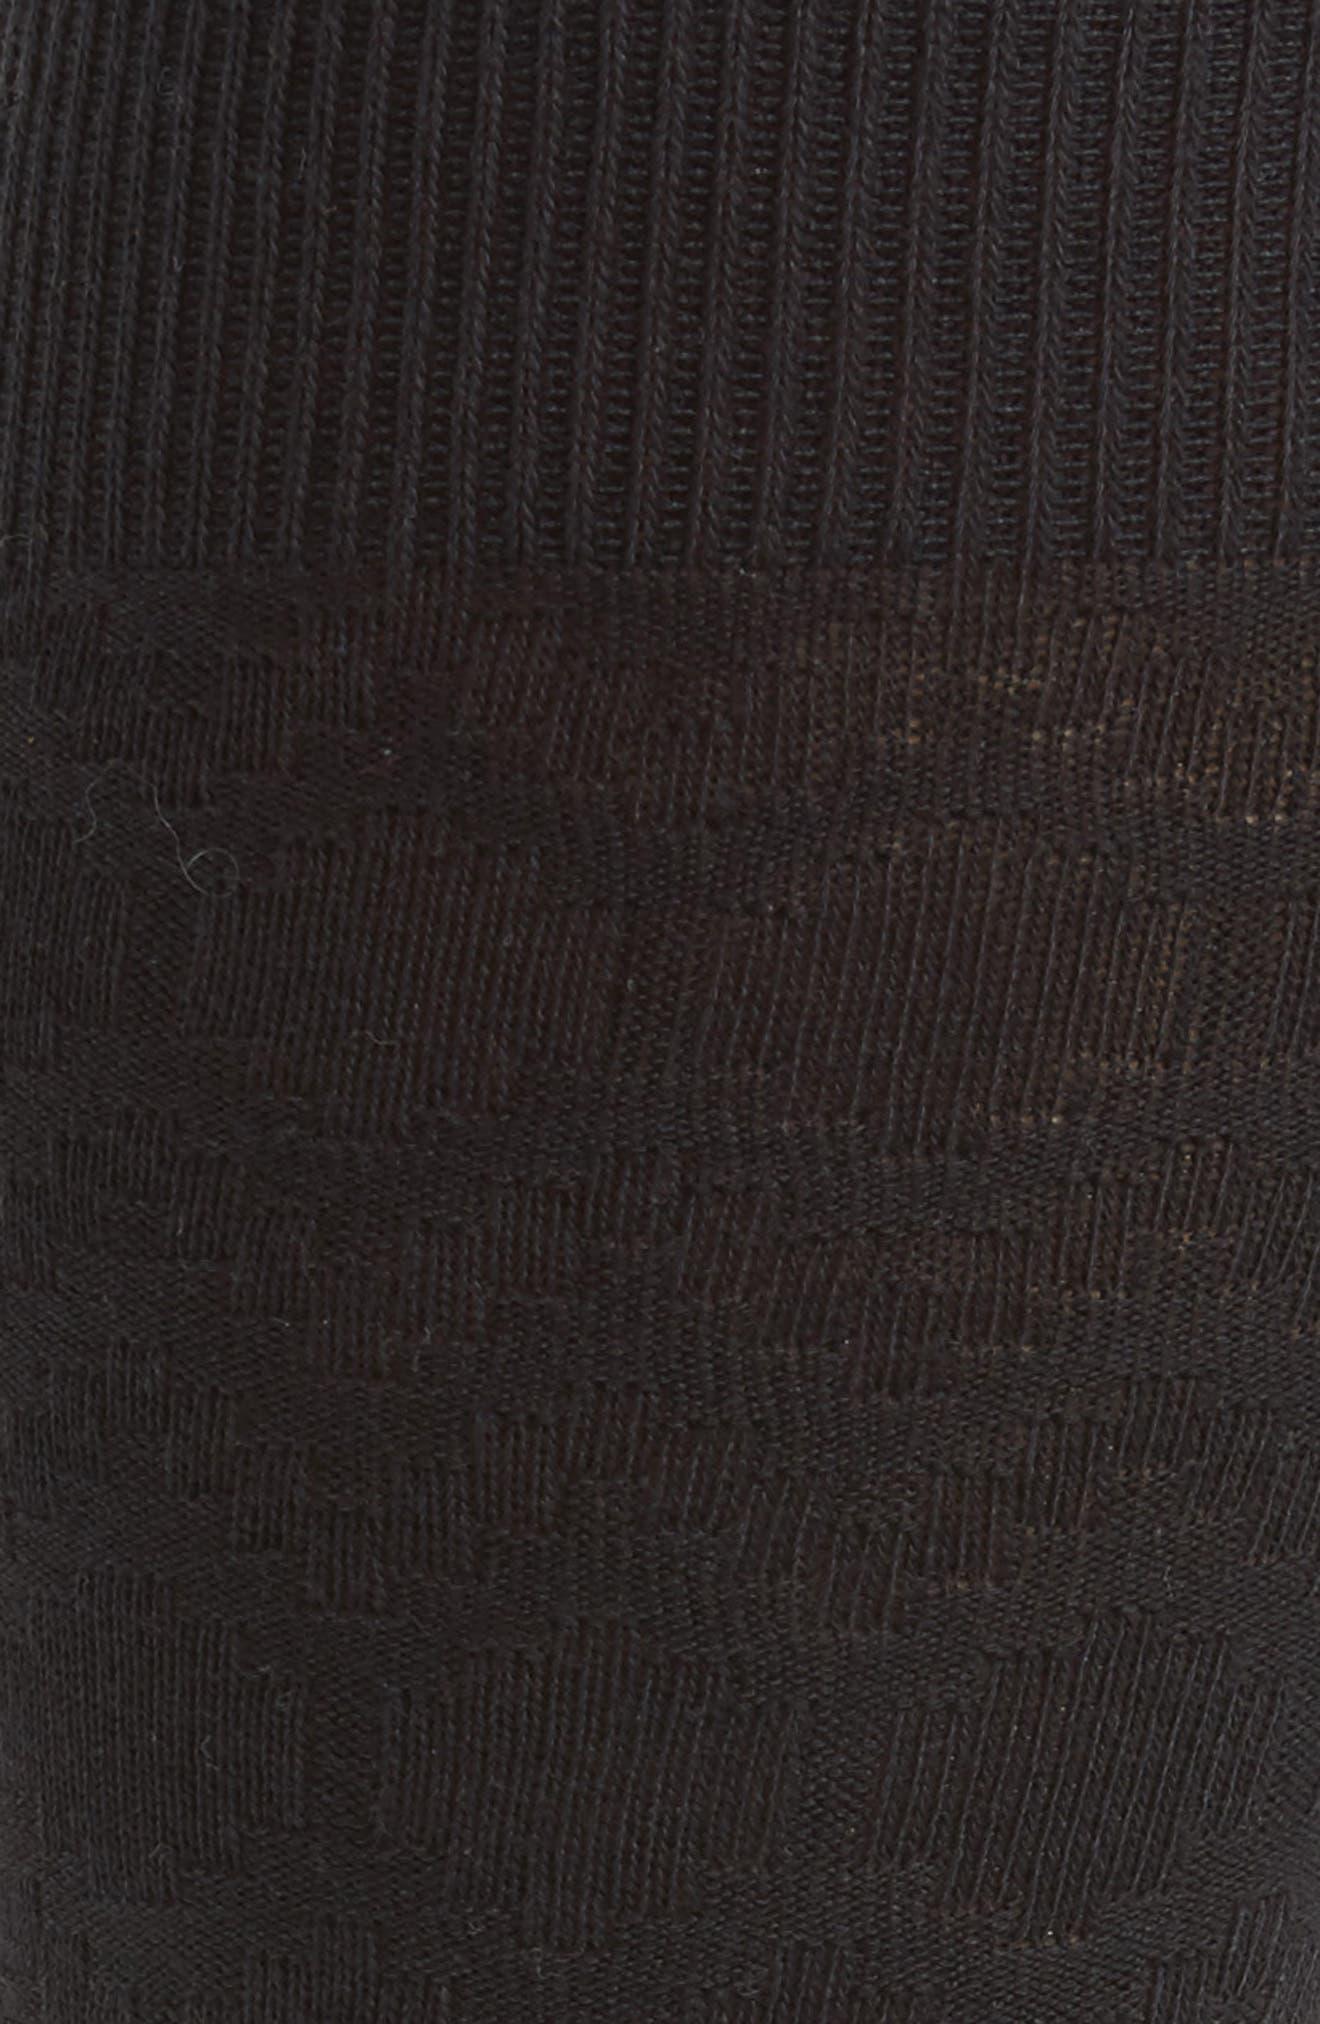 Rug Stripe Texture Socks,                             Alternate thumbnail 2, color,                             001